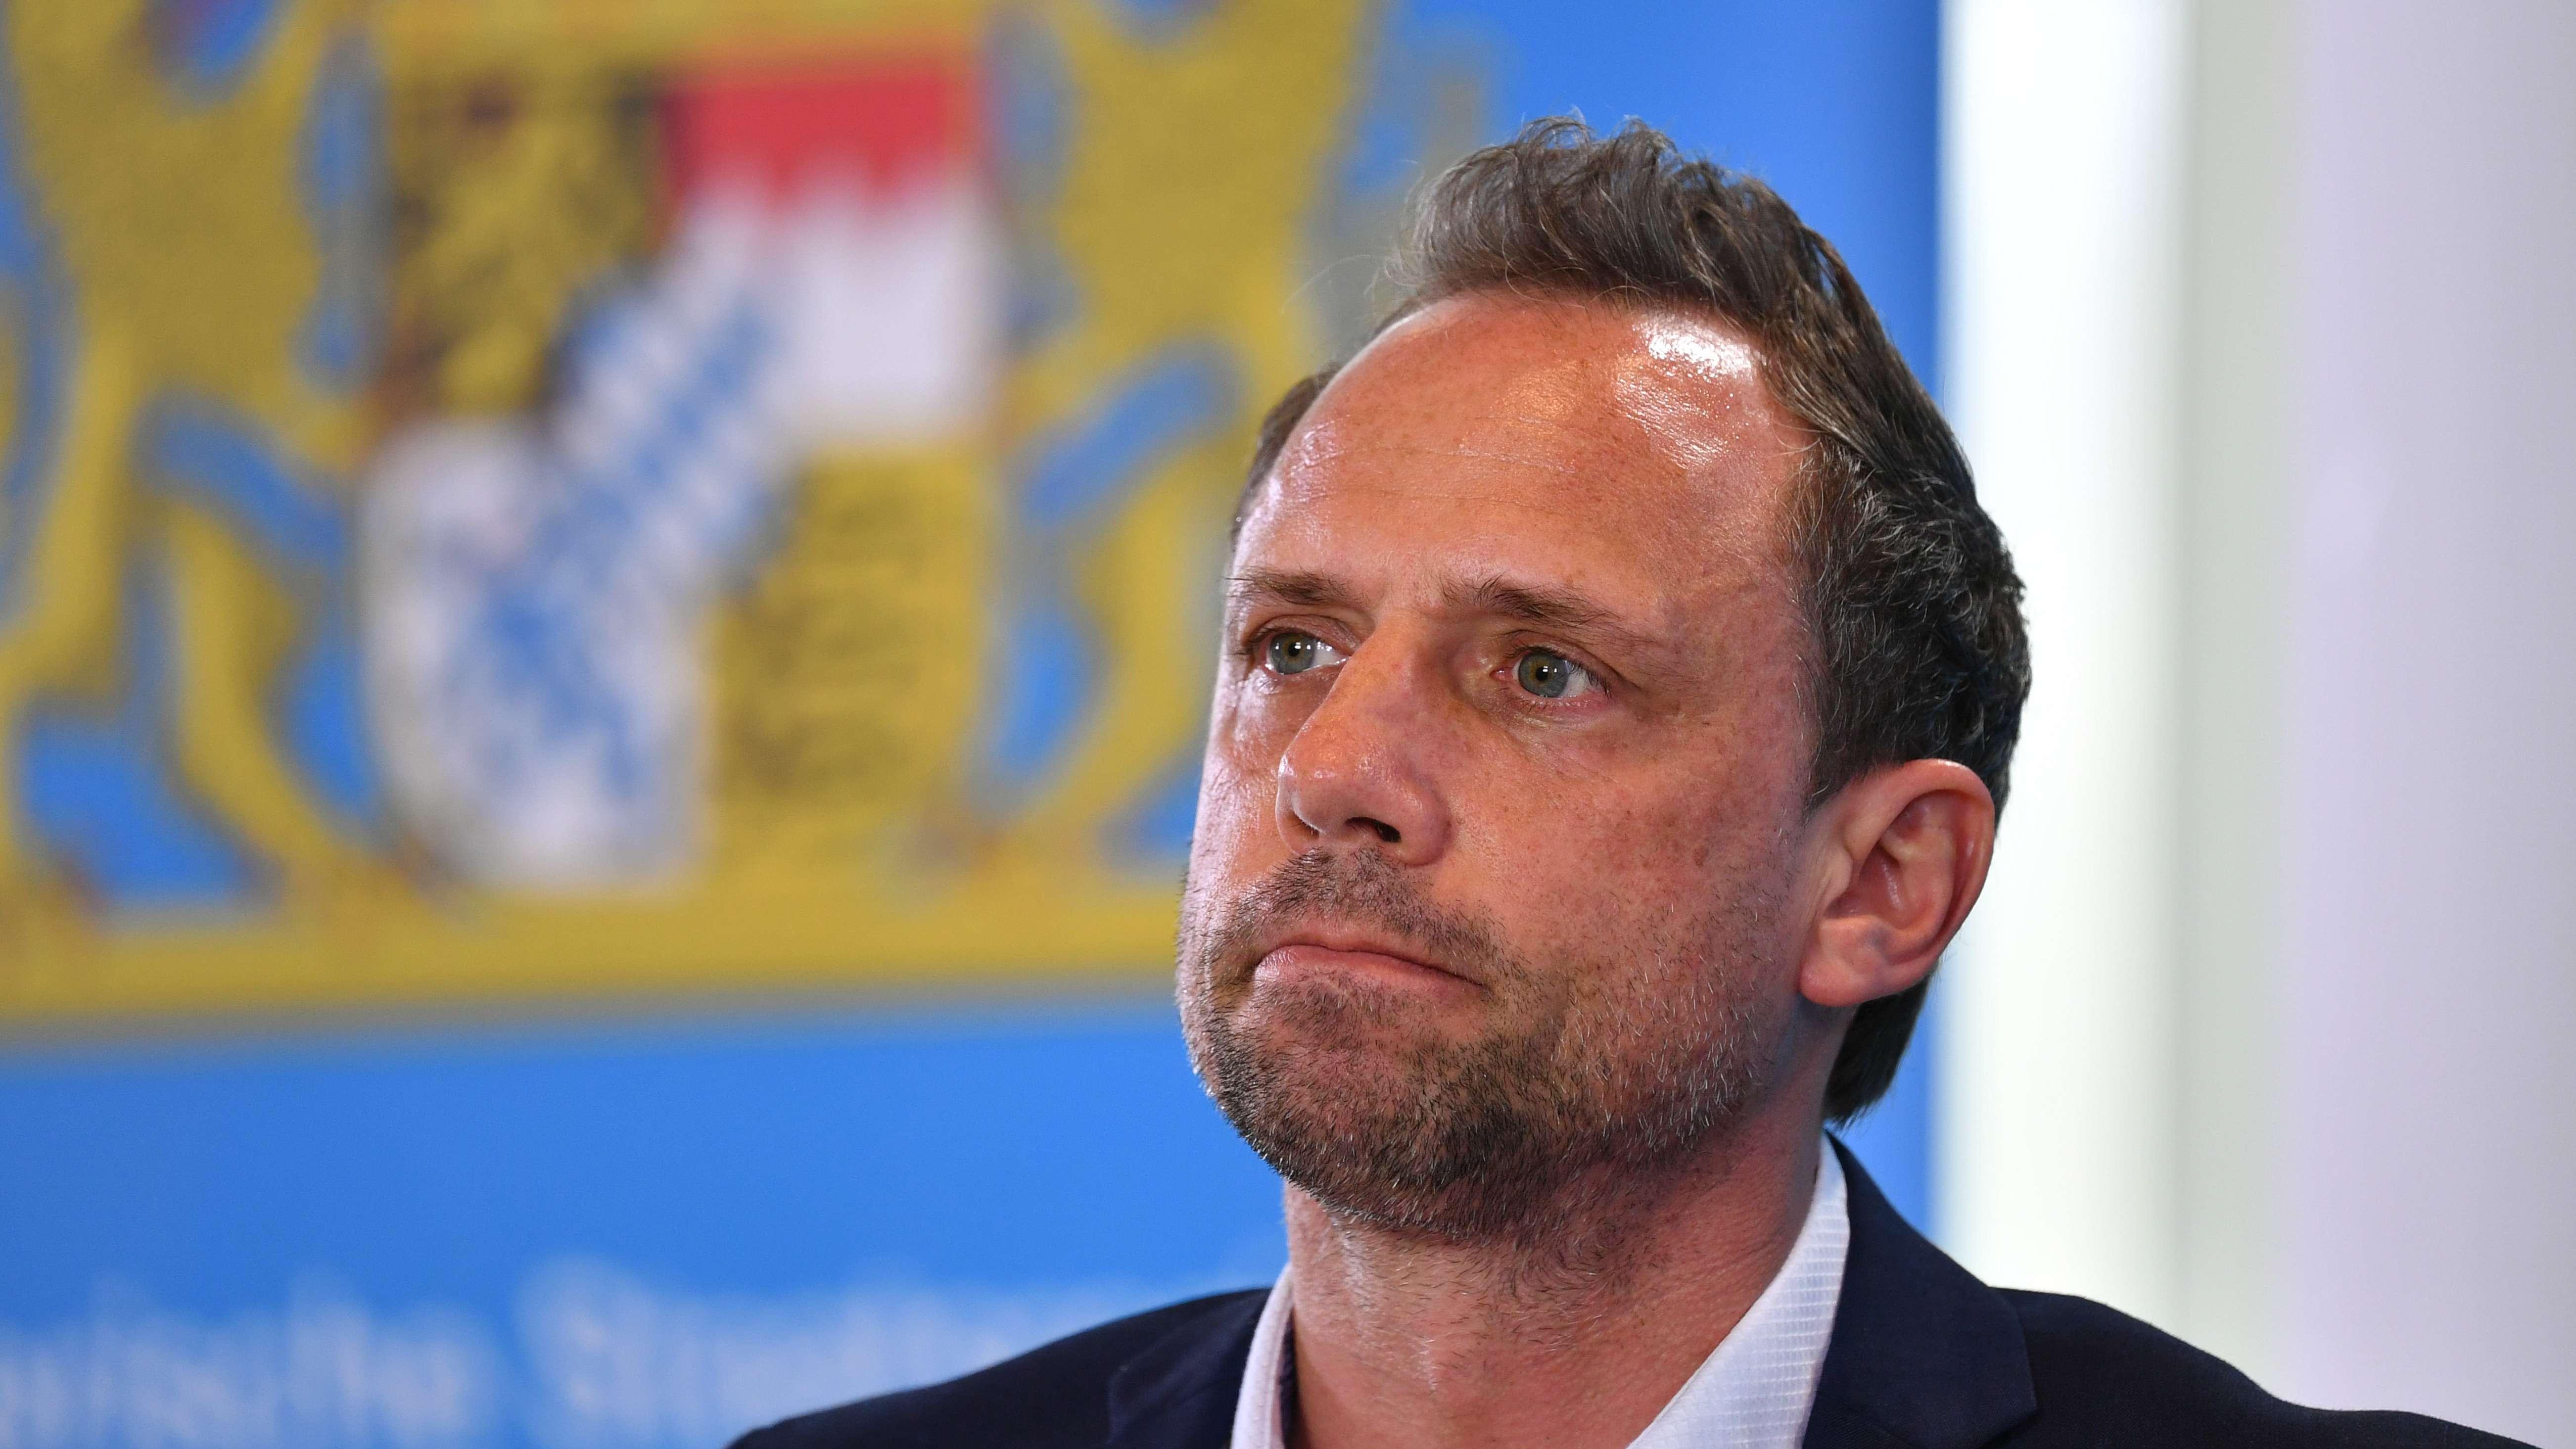 Bayerns Umweltminister Thorsten Glauber